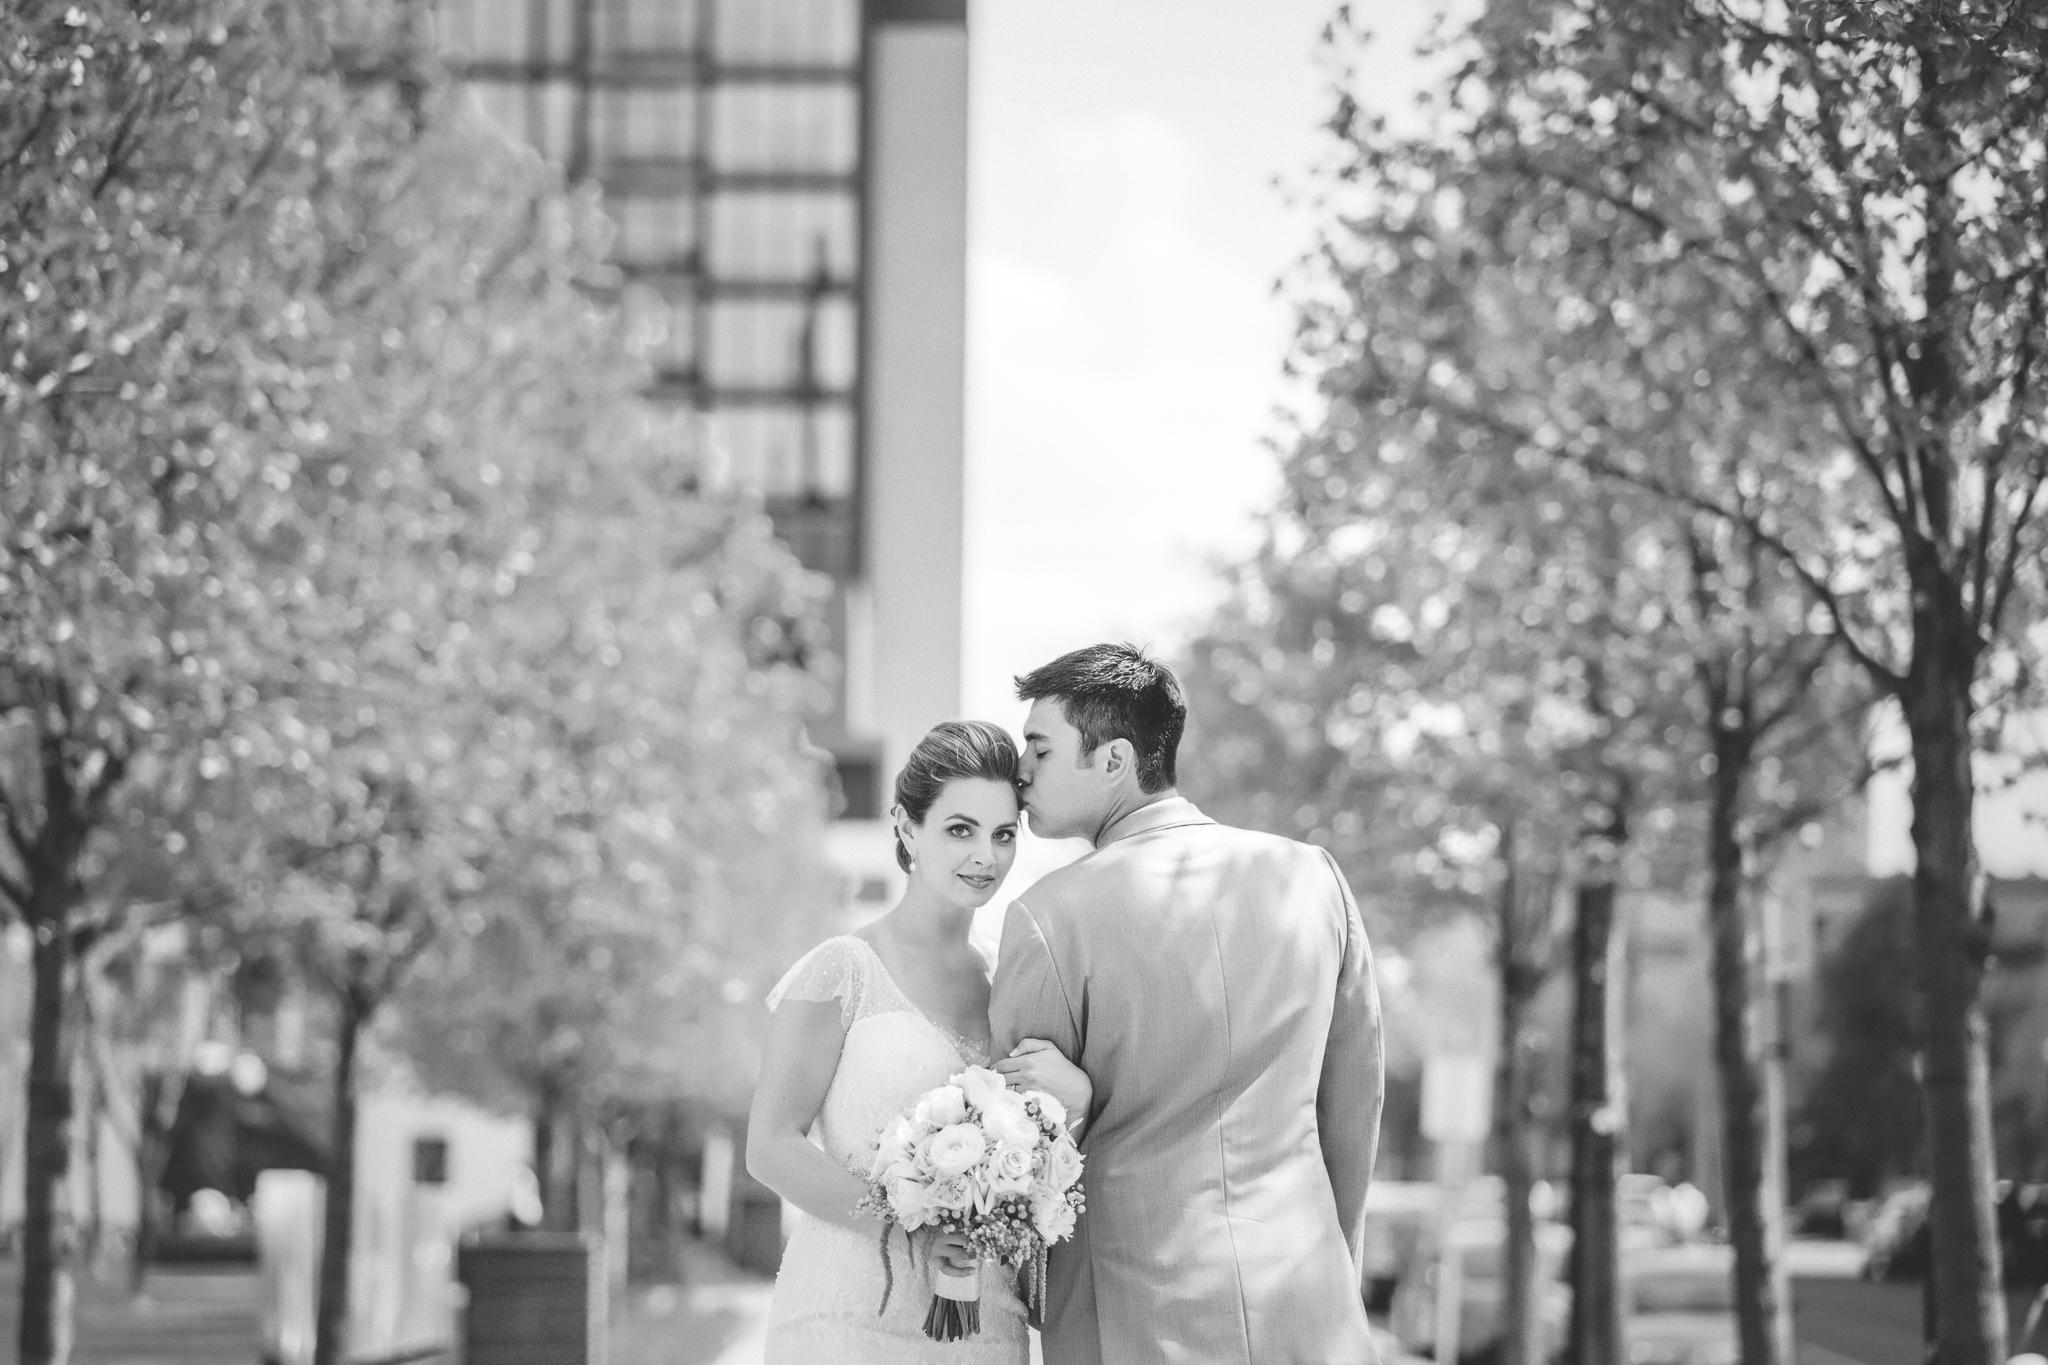 minneapolis event center wedding photographer-11.jpg